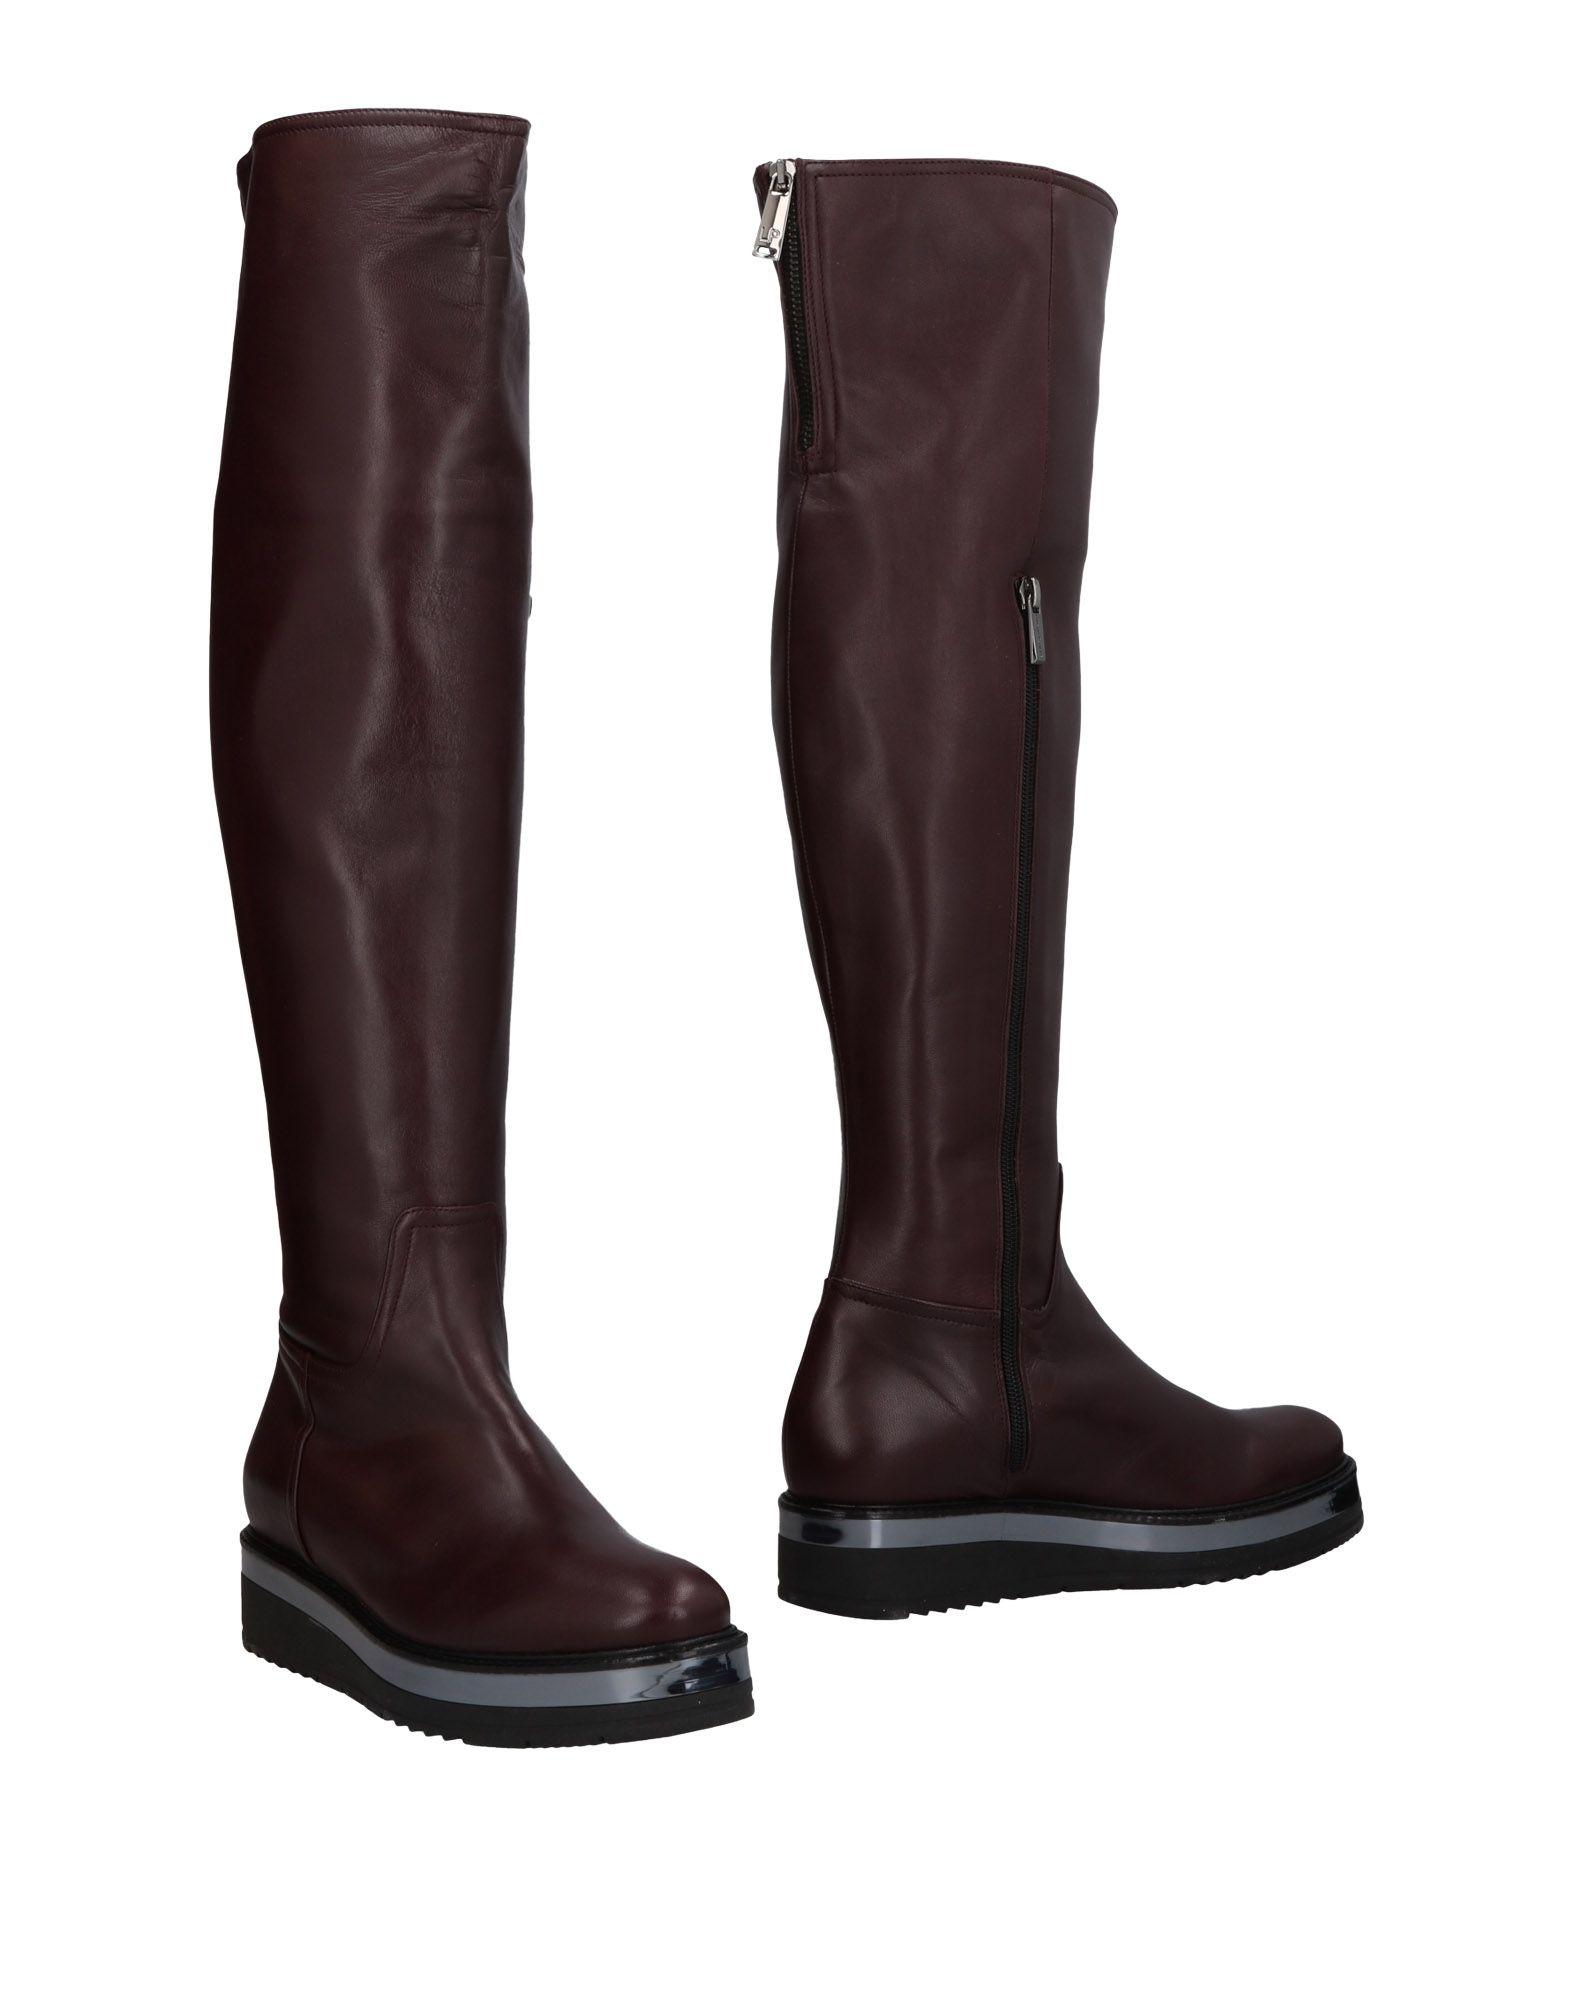 LORETTA PETTINARI Сапоги exull женские ботфорты сапоги вышеколена с толстым и низким каблуком